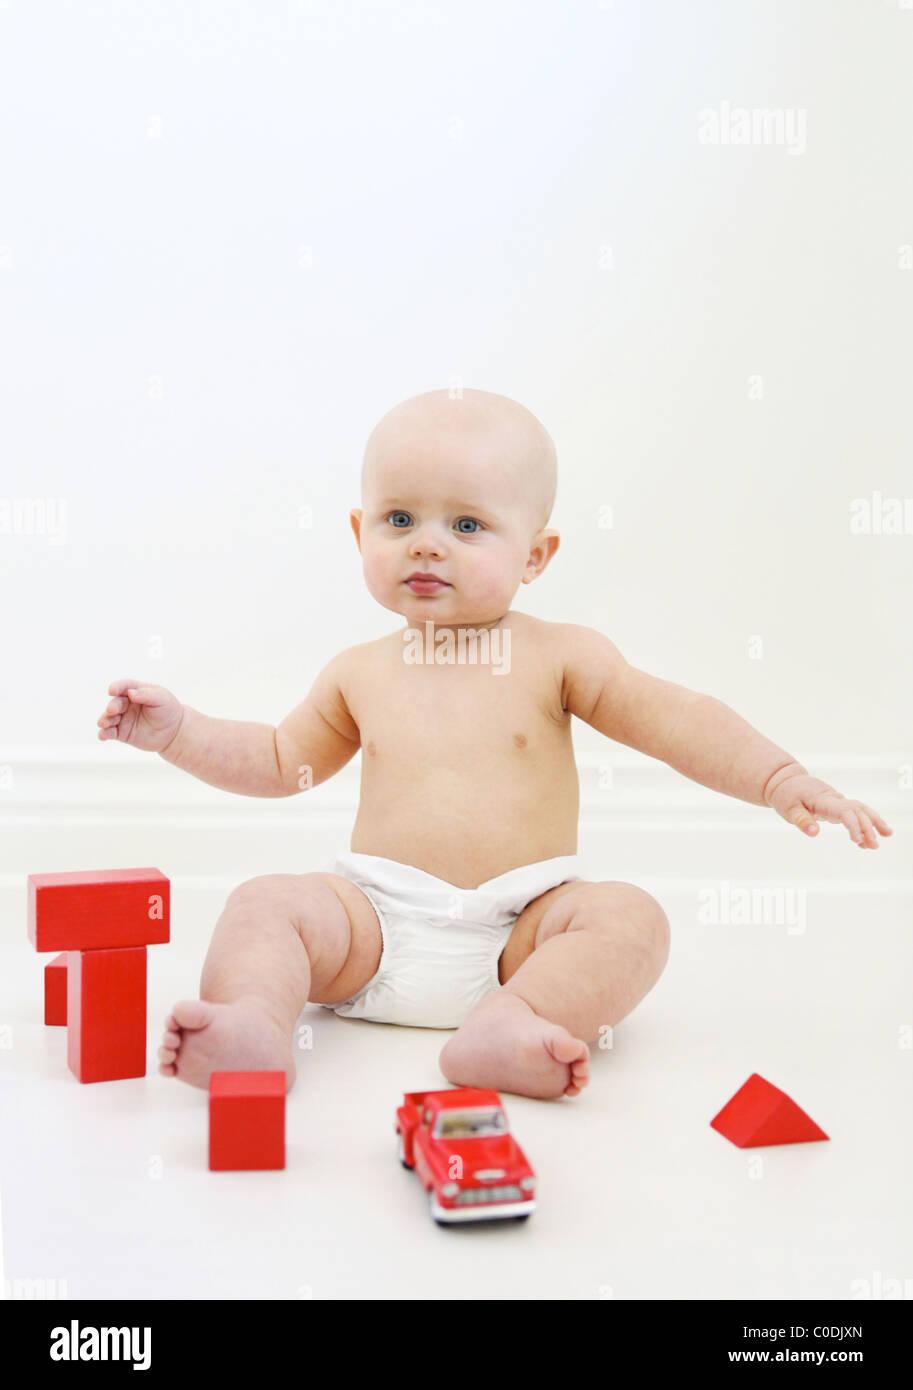 Toys Are Us Boy Stockfotos & Toys Are Us Boy Bilder - Alamy